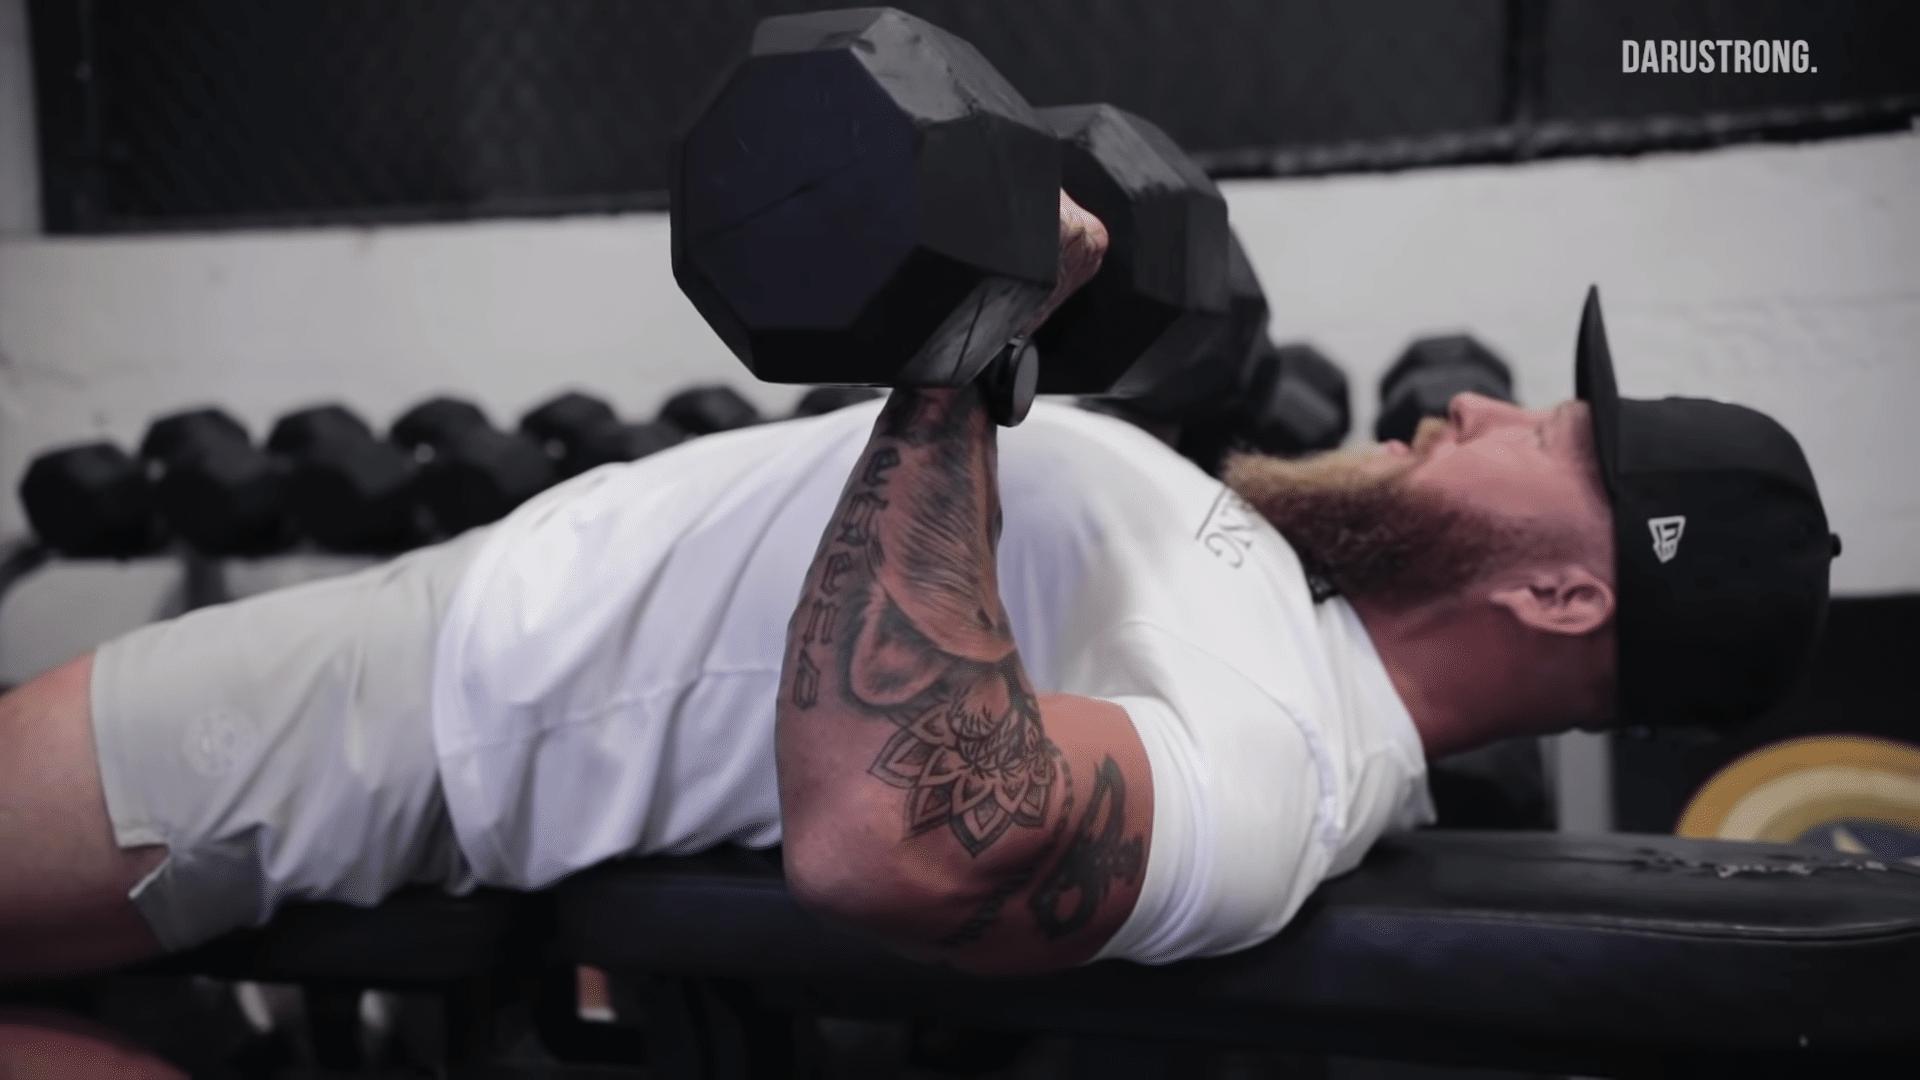 8 Best Dumbbell Exercises for Combat Sports Performance 3